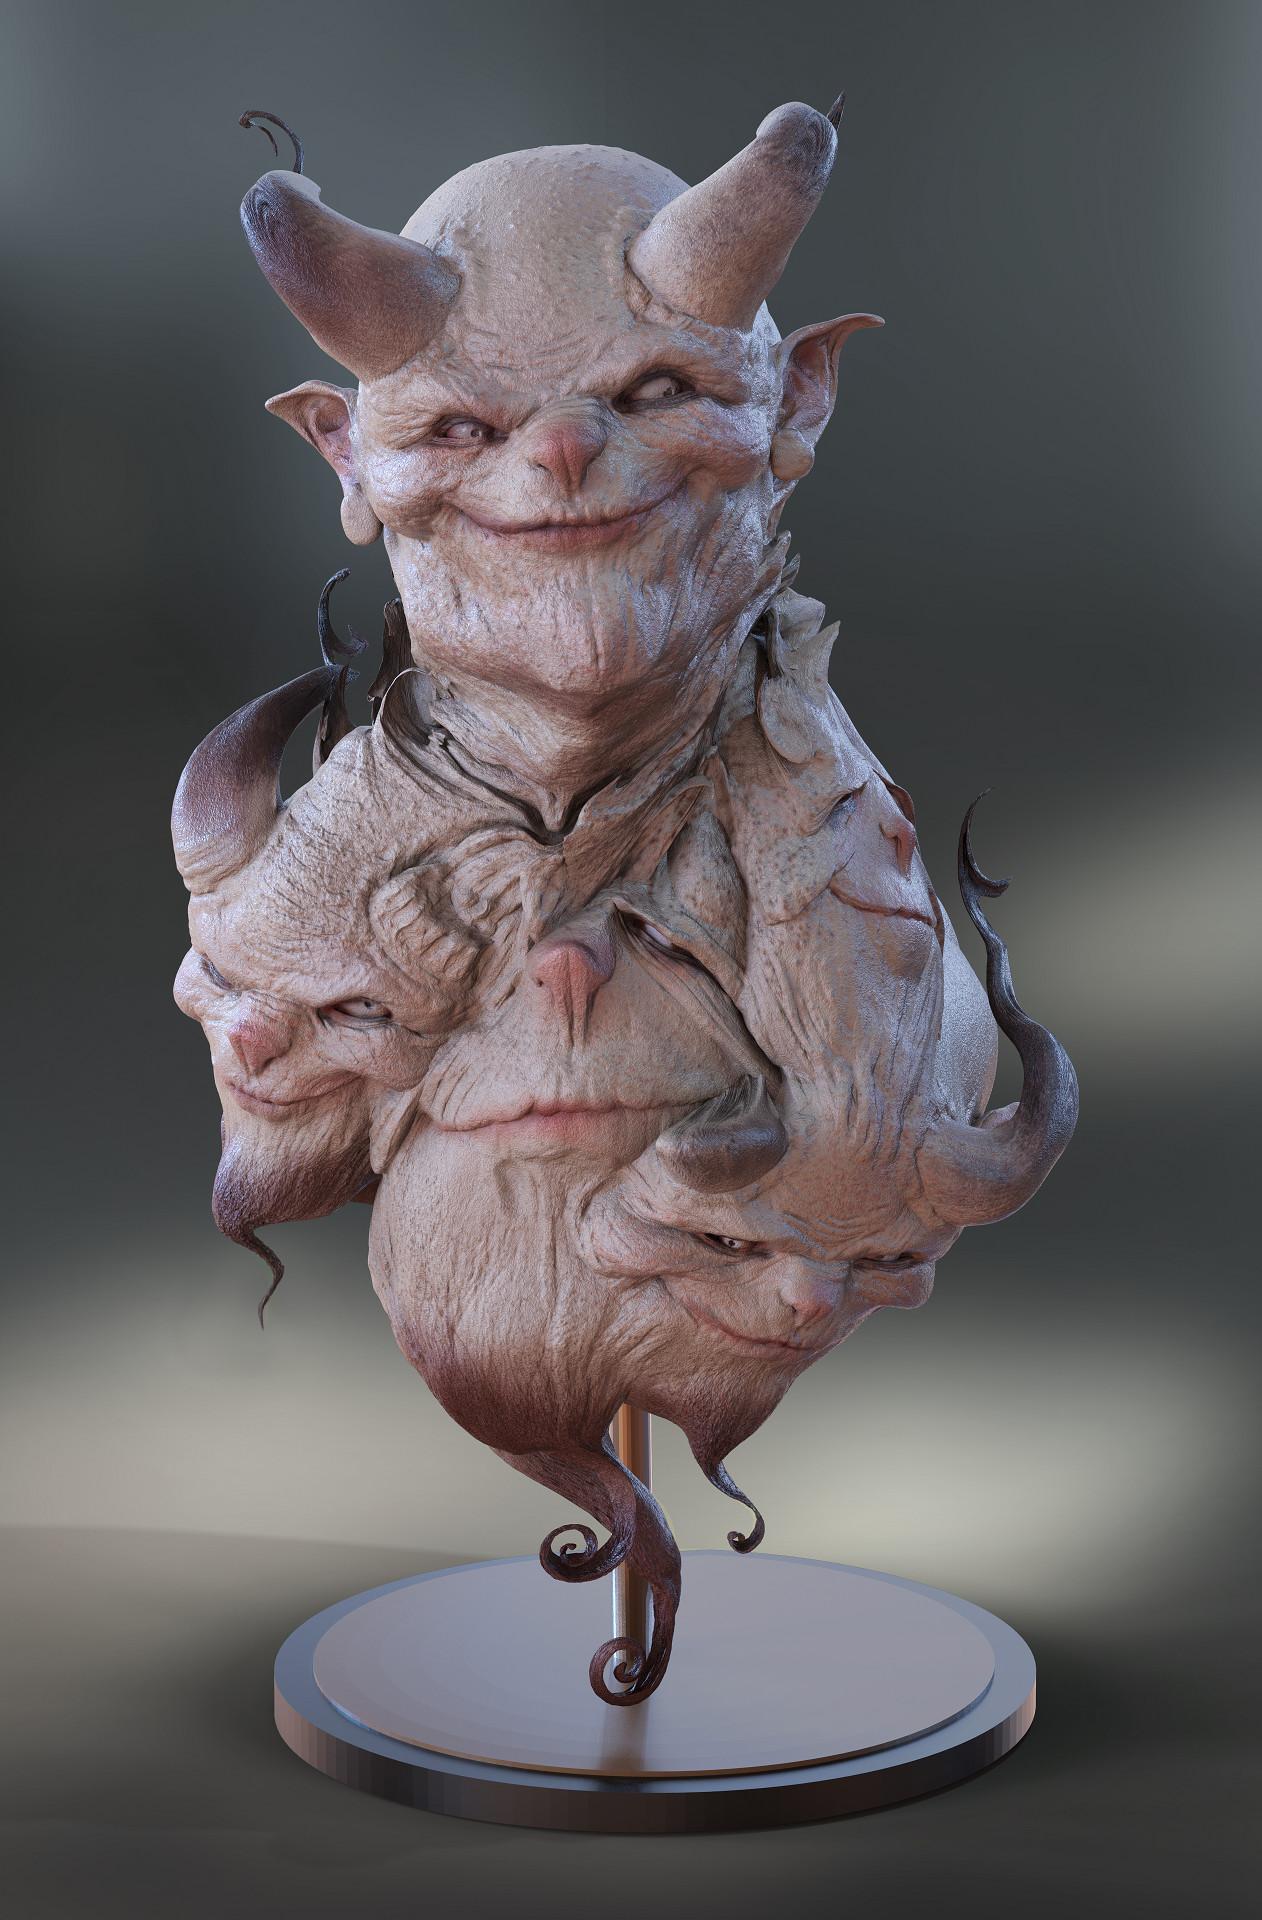 Gilberto soren zaragoza busto personal demonio low